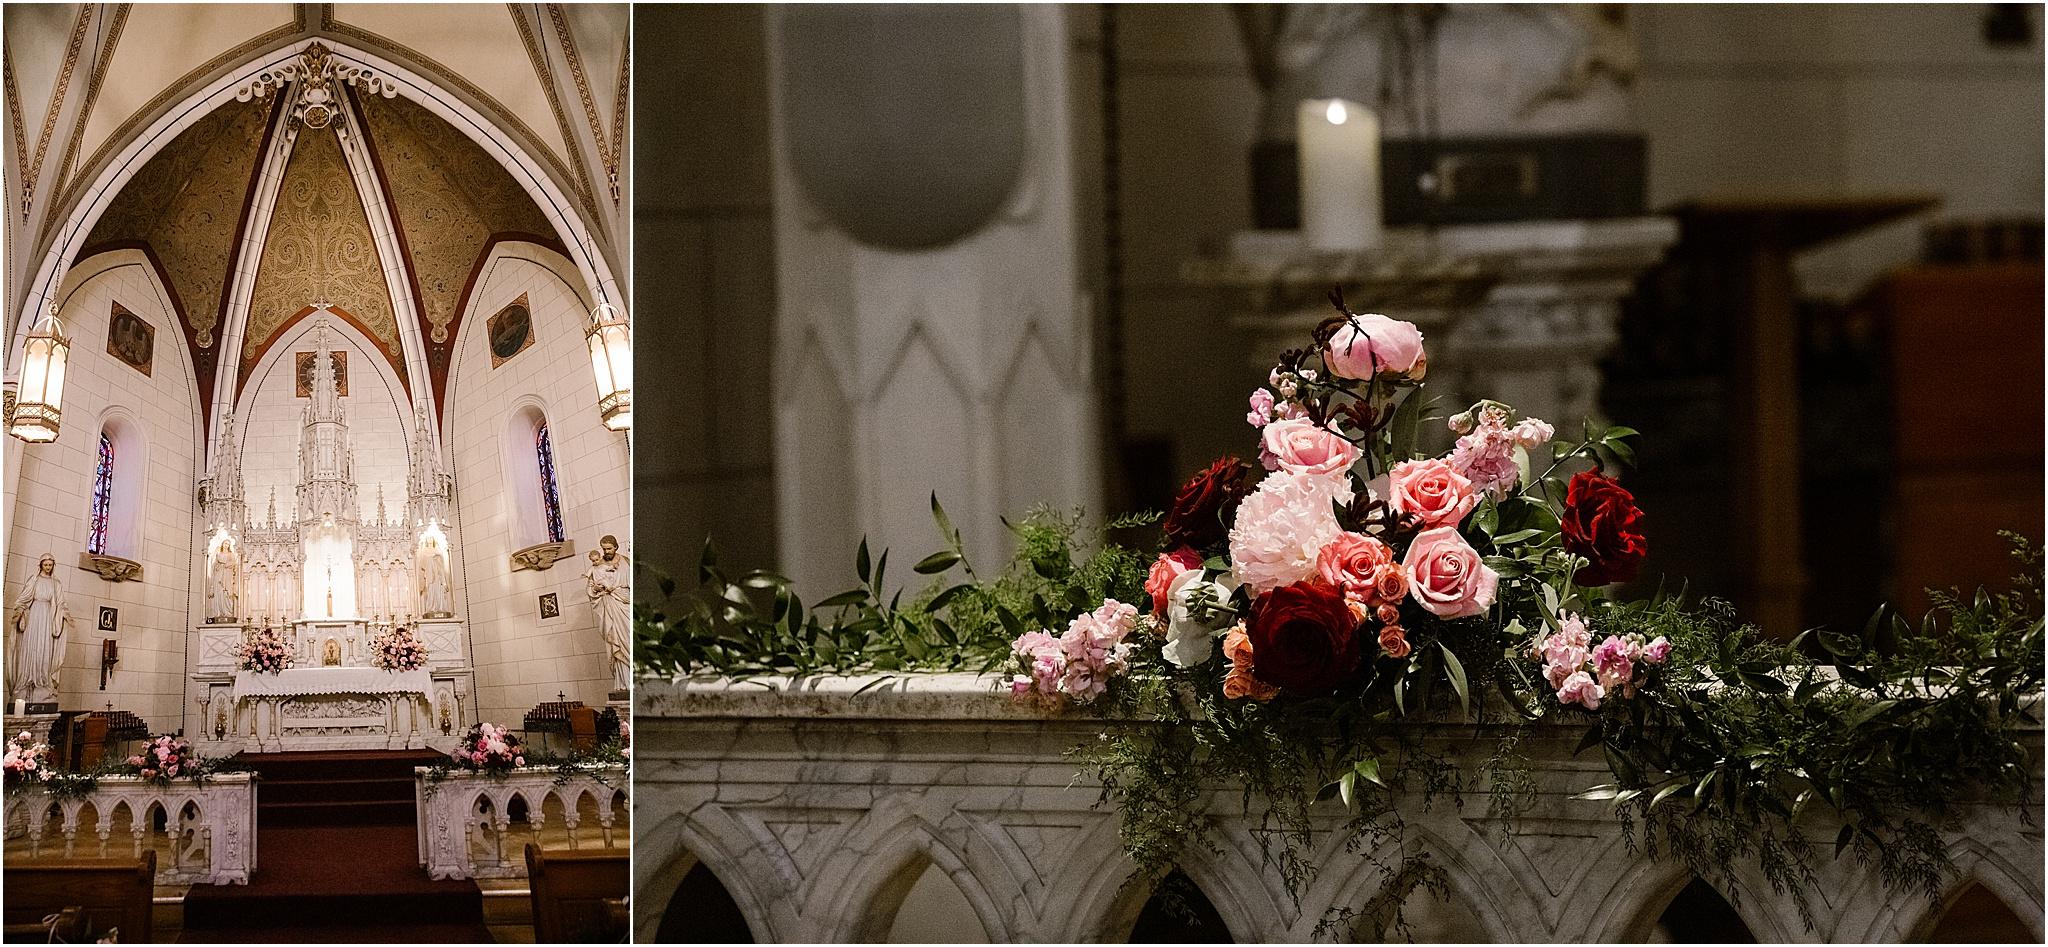 BLUE ROSE PHOTOGRAPHY SANTA FE WEDDING_15